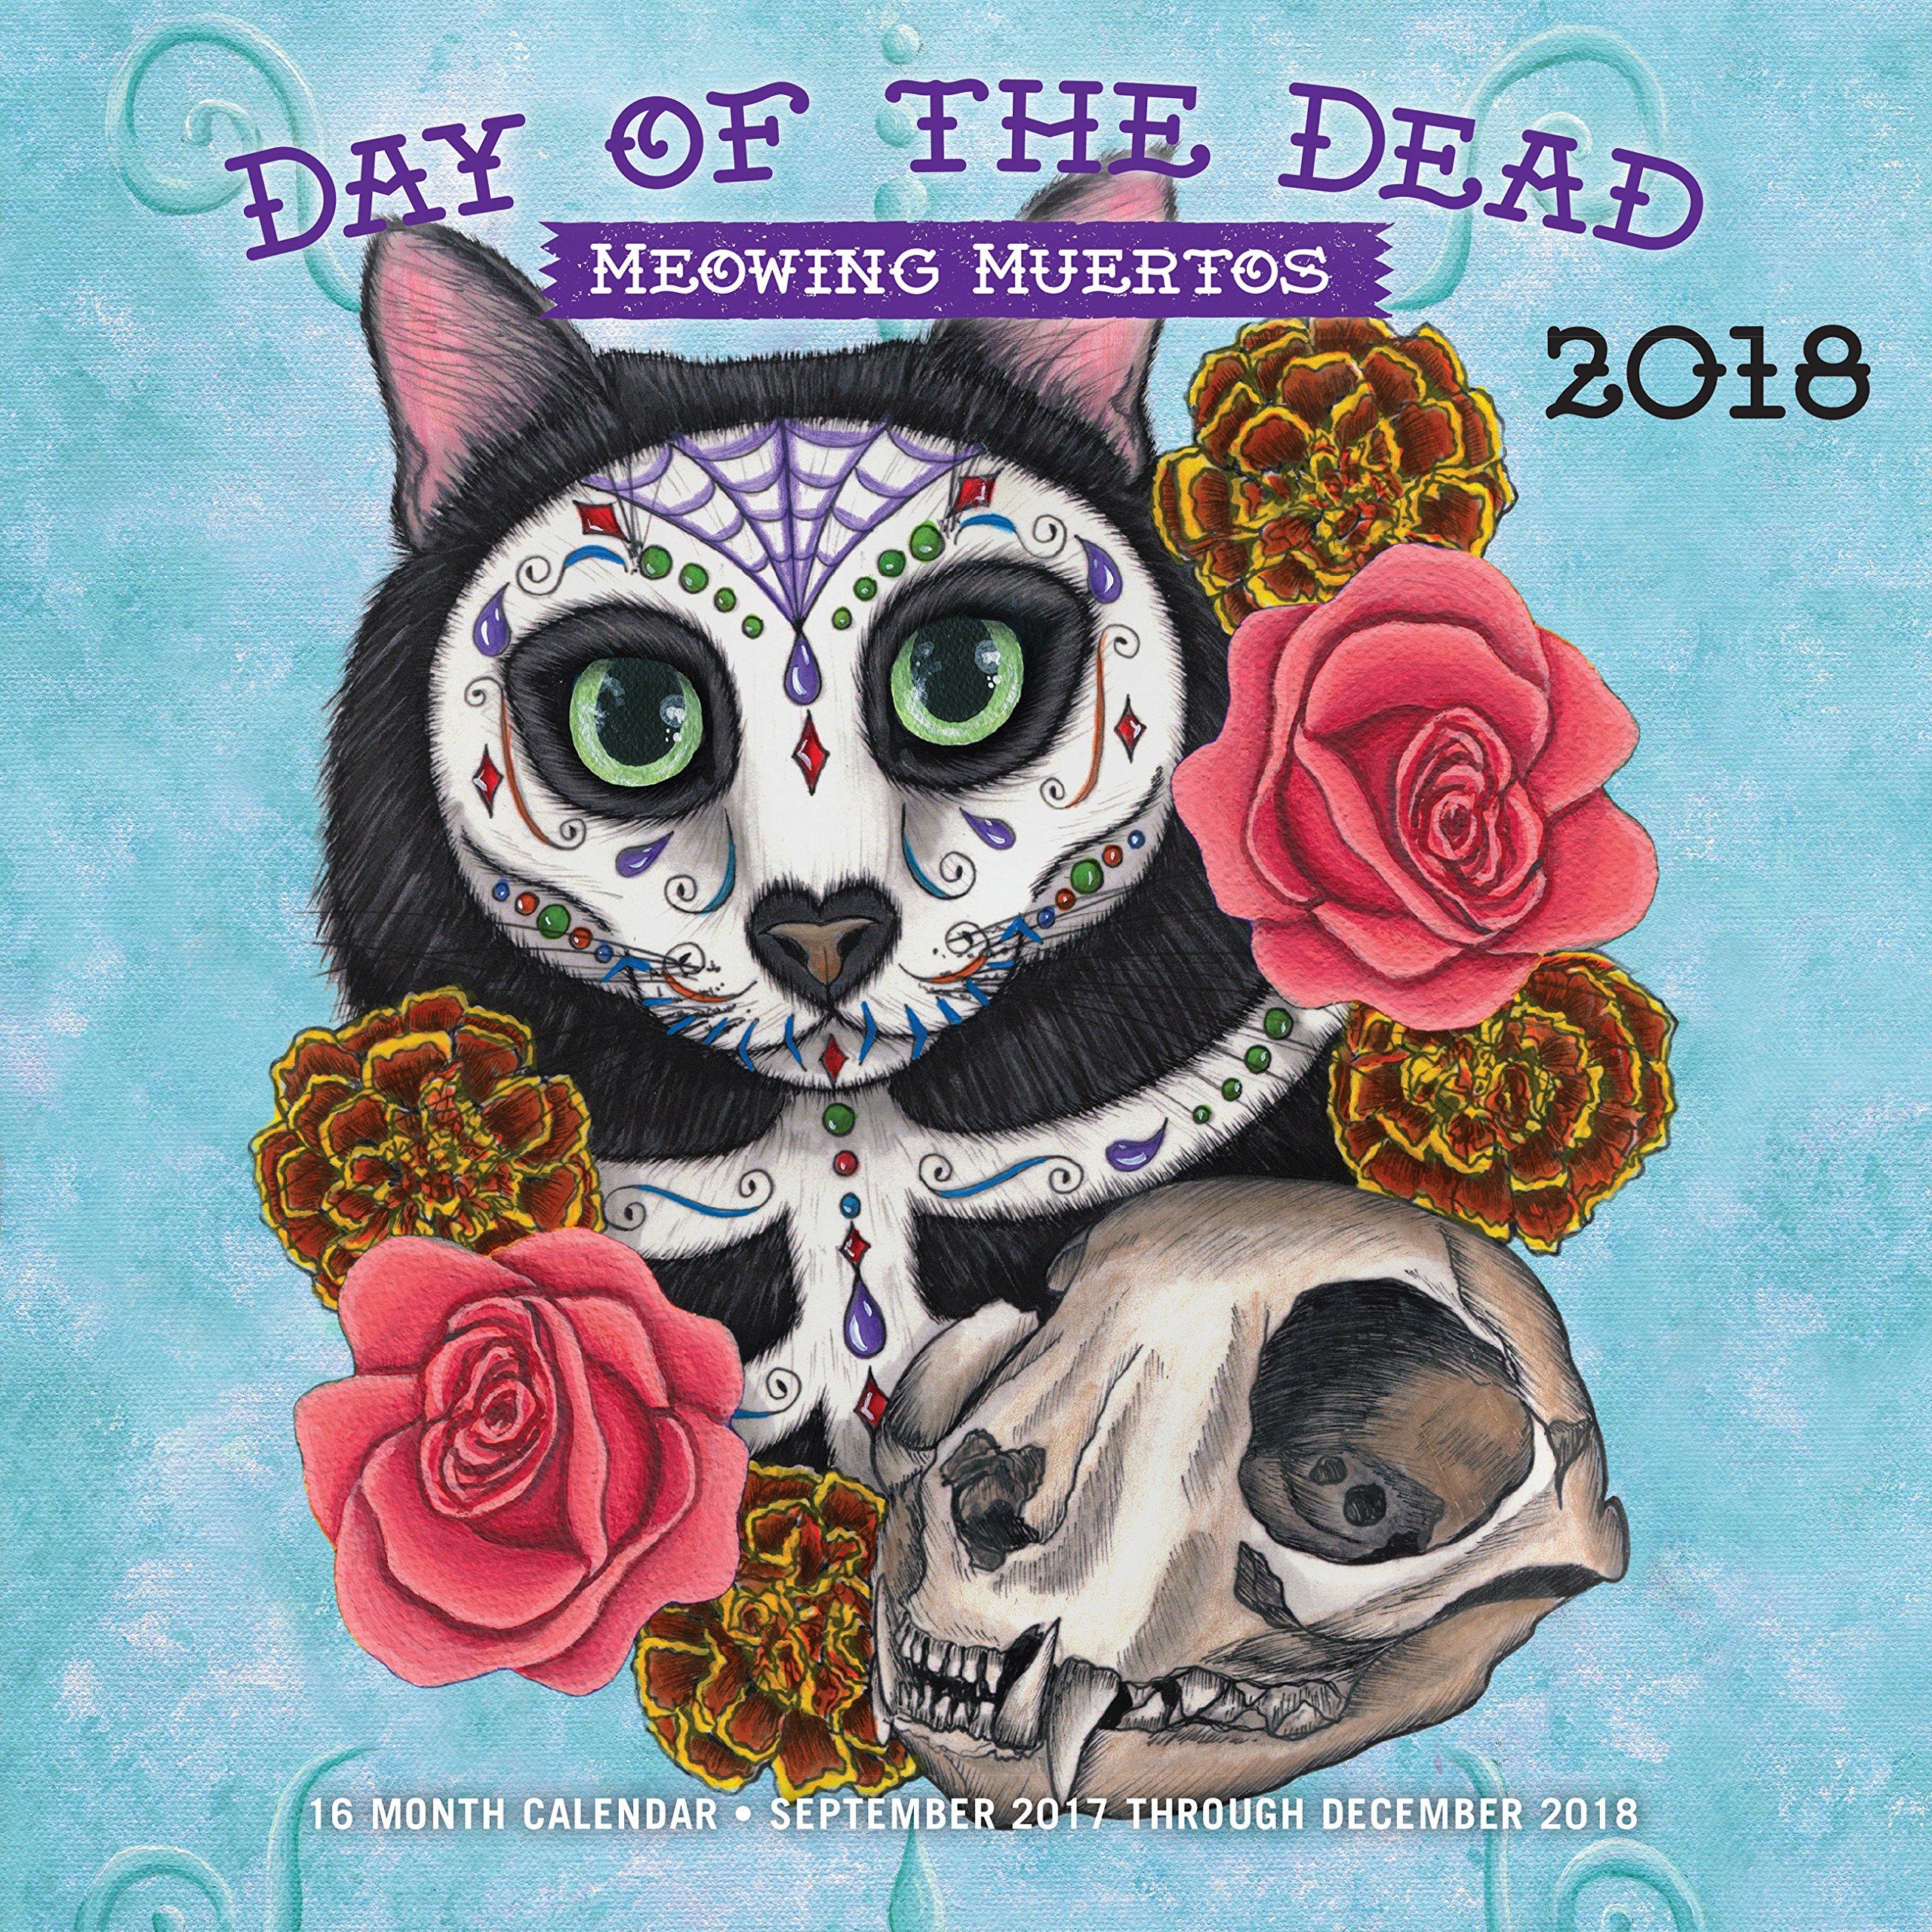 day of the dead meowing muertos 2017 16 month calendar september 2016 through december 2017